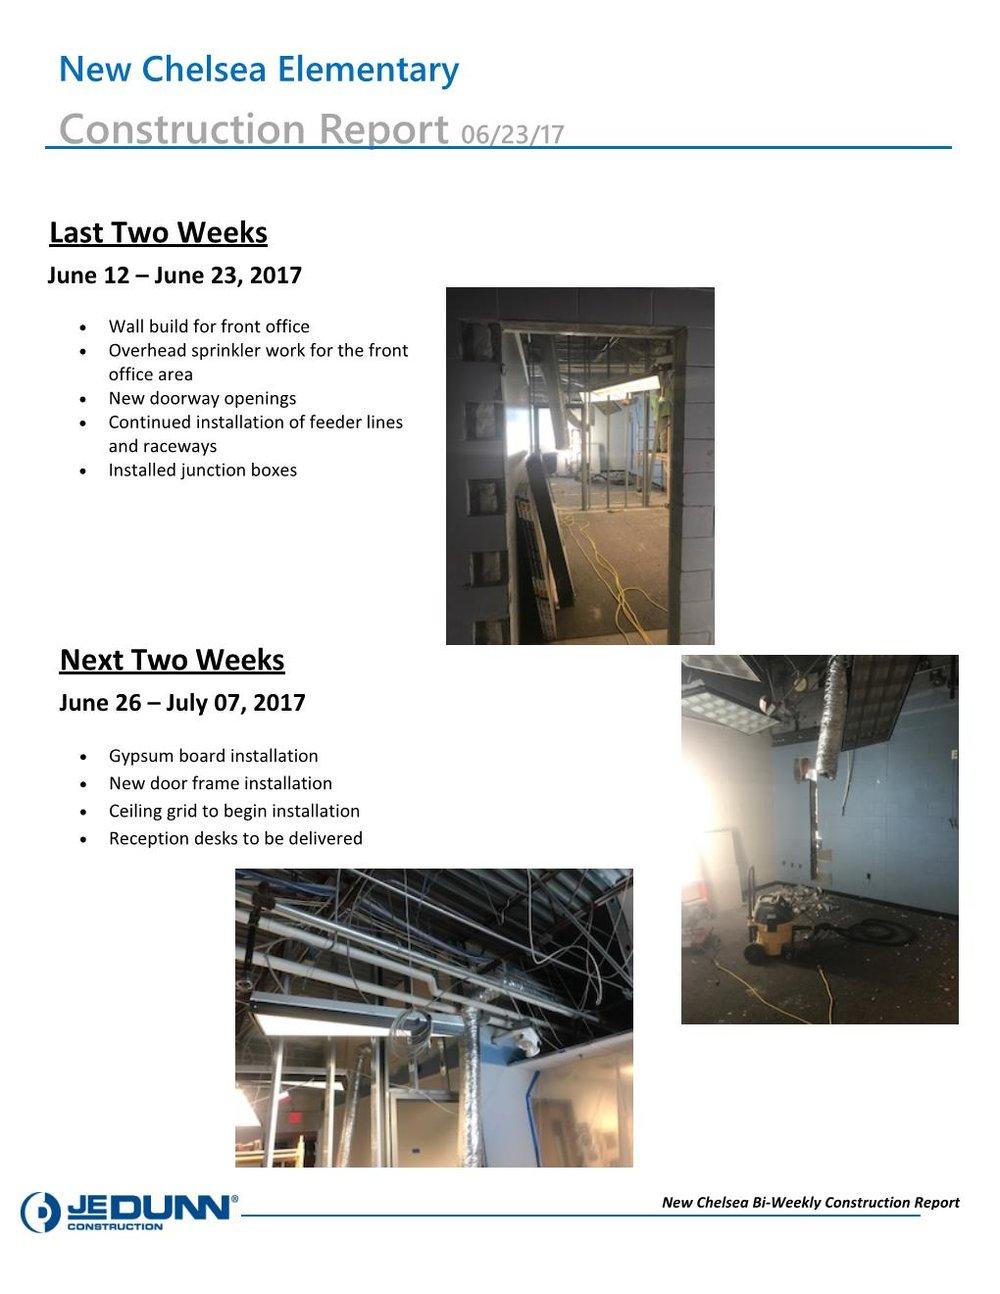 New Chelsea Construction Report 06.23.17.jpg